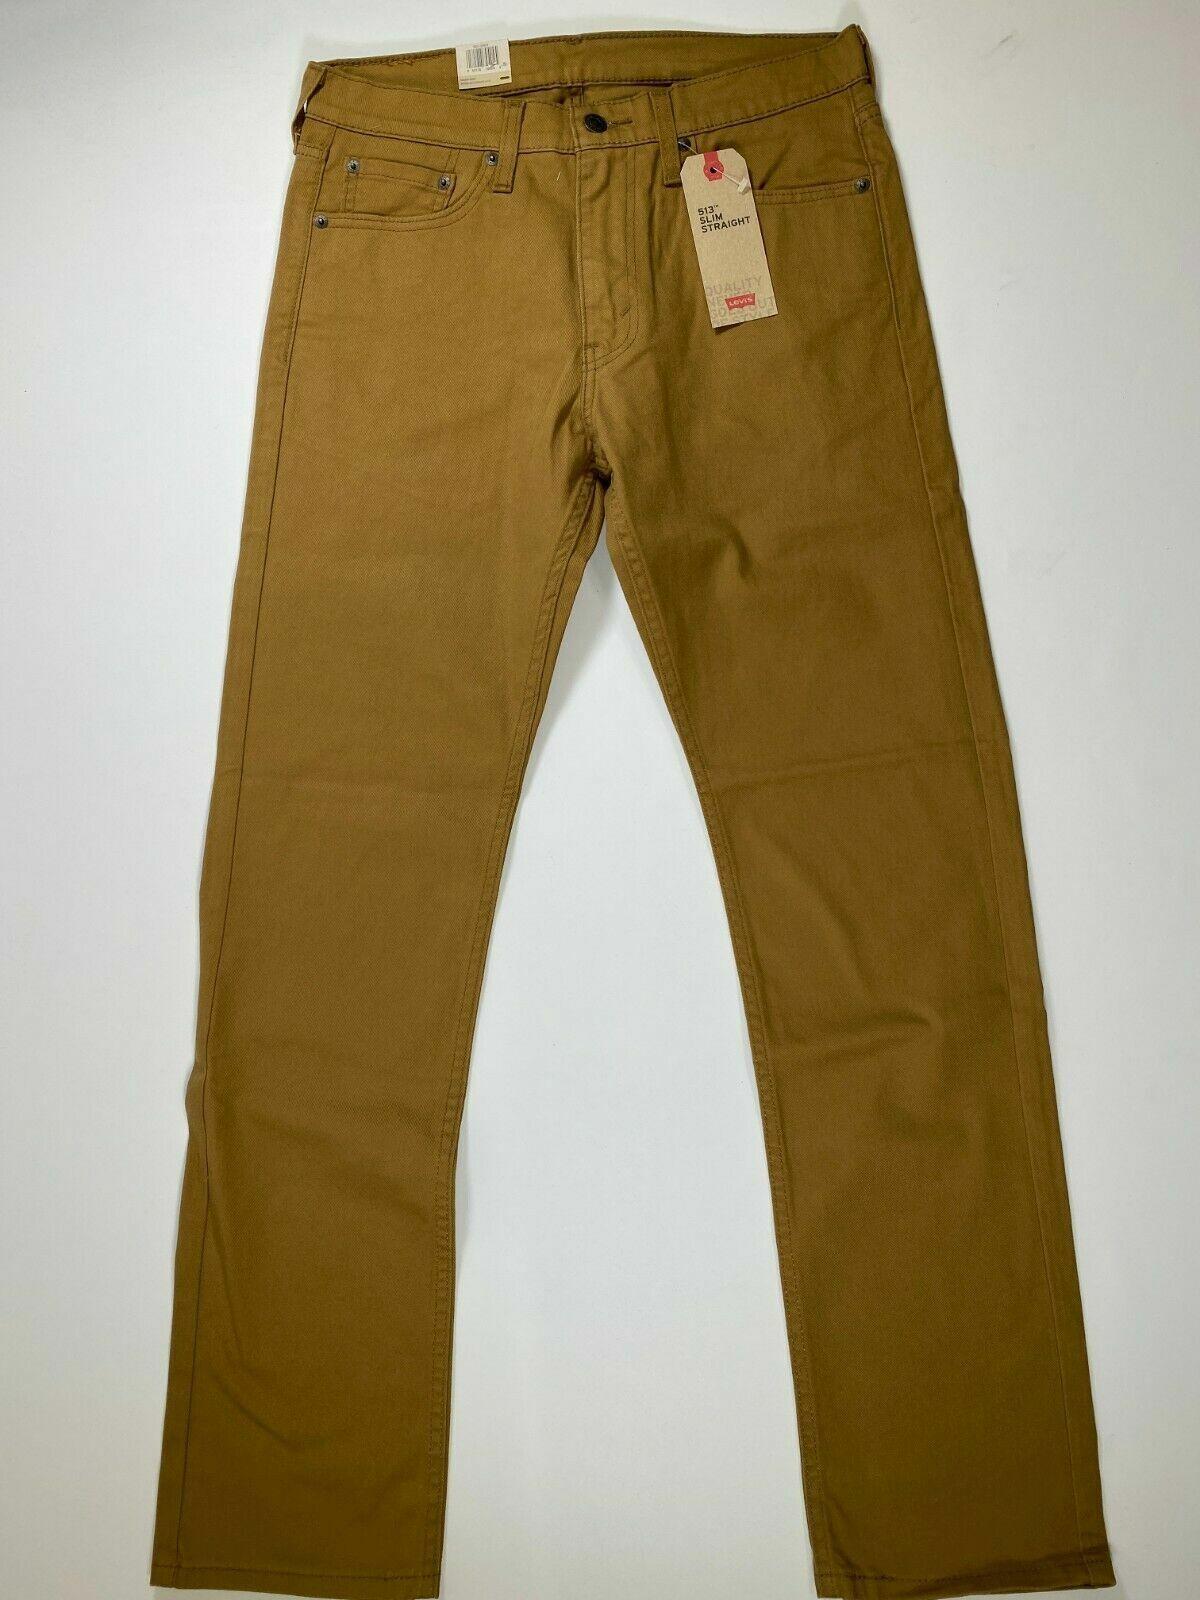 Mens Levis 513 Slim Straight Beige Denim Jeans 31x32 NEW! NW